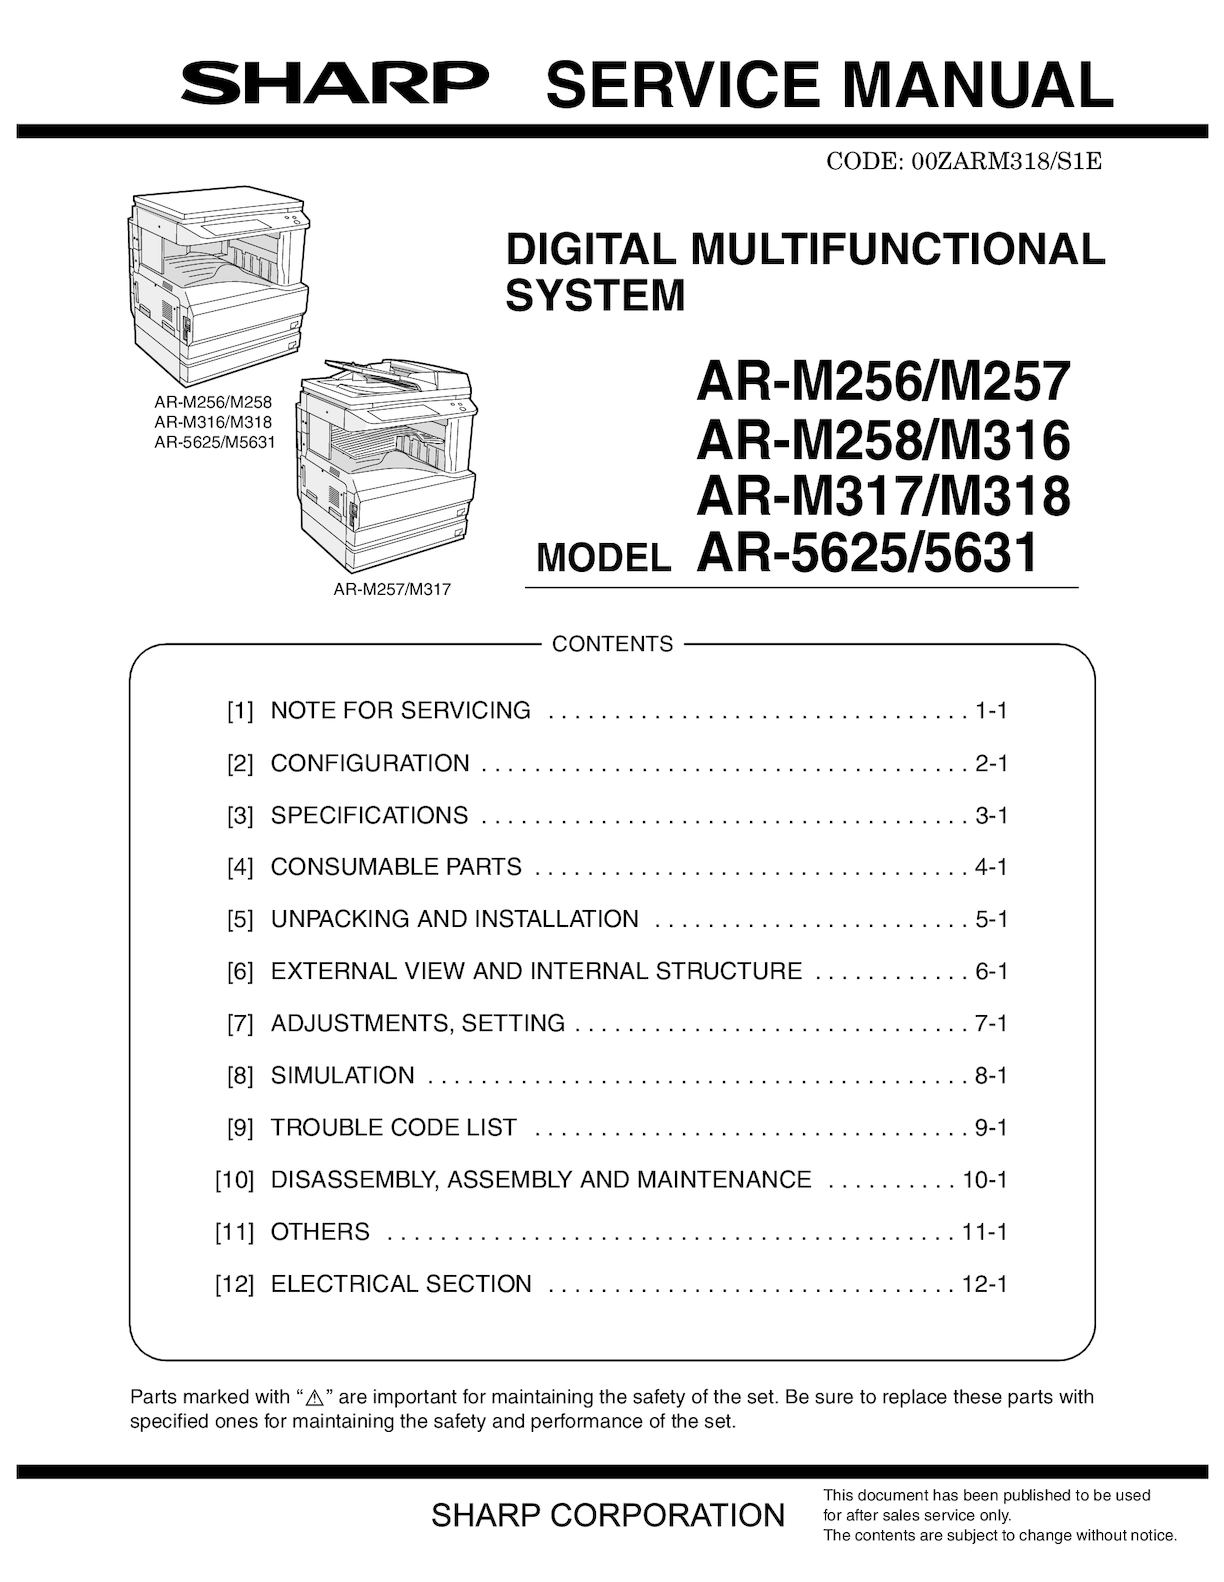 Calamo Ar M 5625 M5631 Sme Mt8870 Dtmf Telephone Dial Tone Decoder Circuit Diagram Nonstopfree